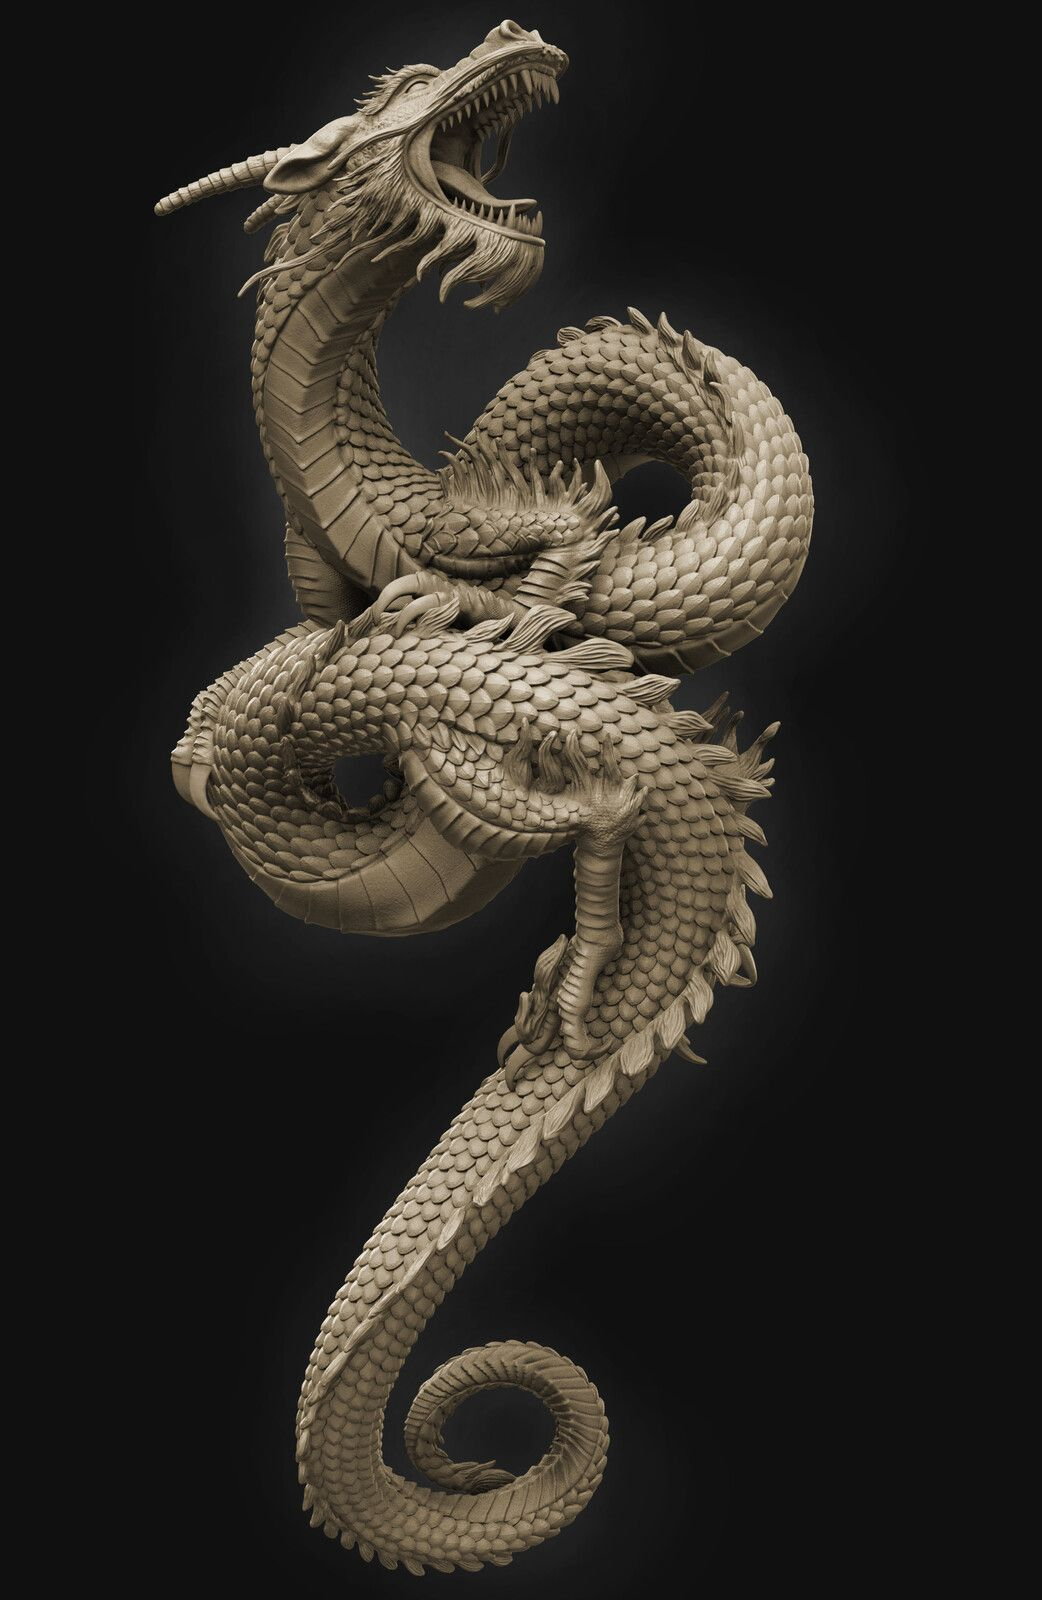 Chinese Dragon for 3D printing, pankaj kumar on ArtStation